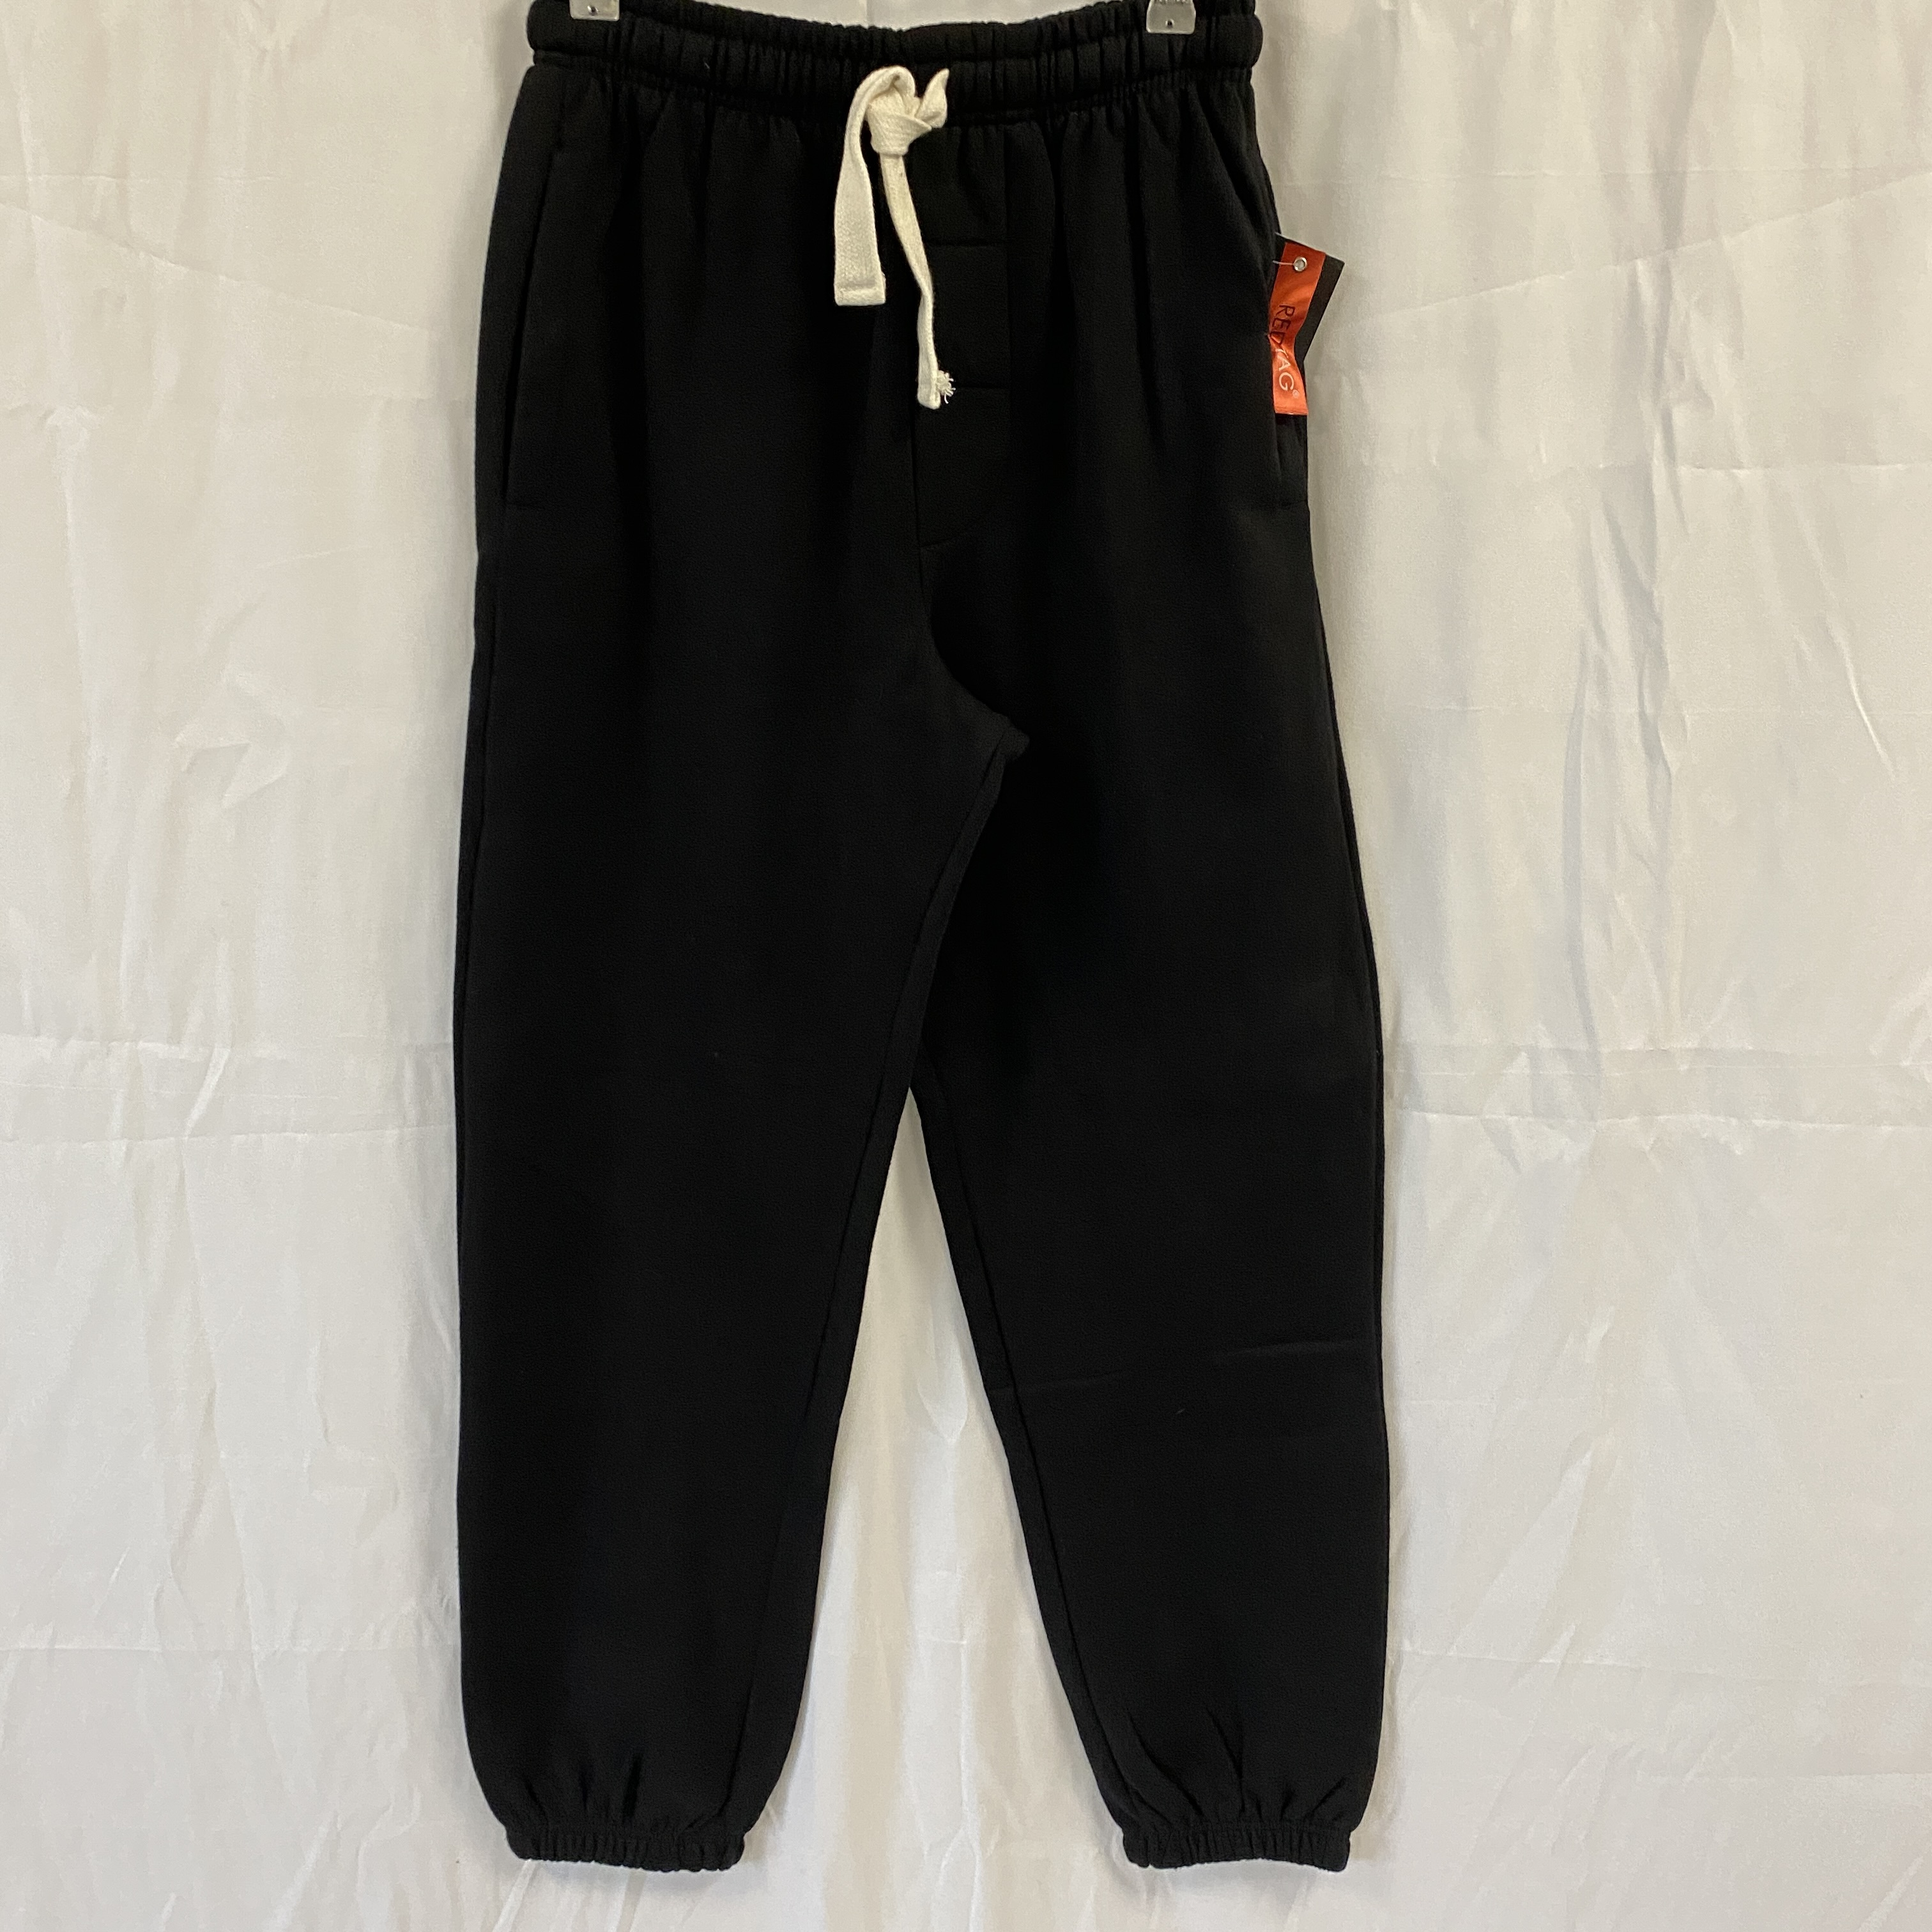 Brand New RedTag Black Jogging Bottoms - Size S